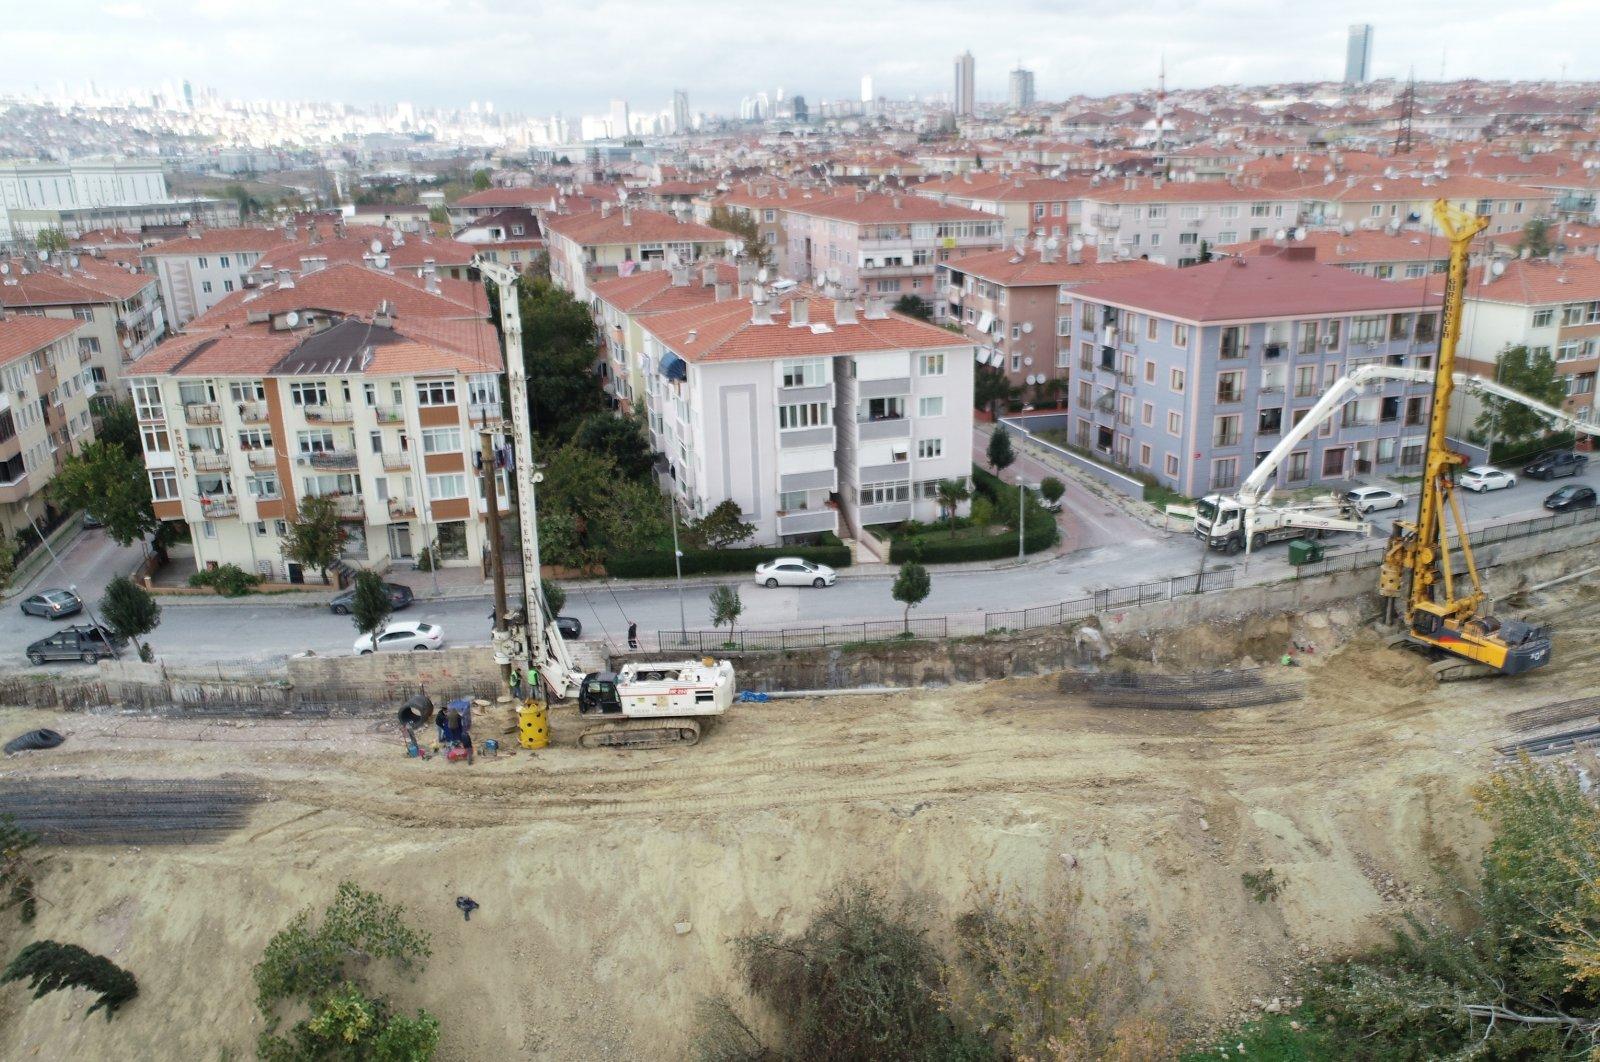 Workers install bored piles in the Ambarlı neighborhood, in Avcılar district, Istanbul, Turkey, Nov. 23, 2020. (DHA Photo)